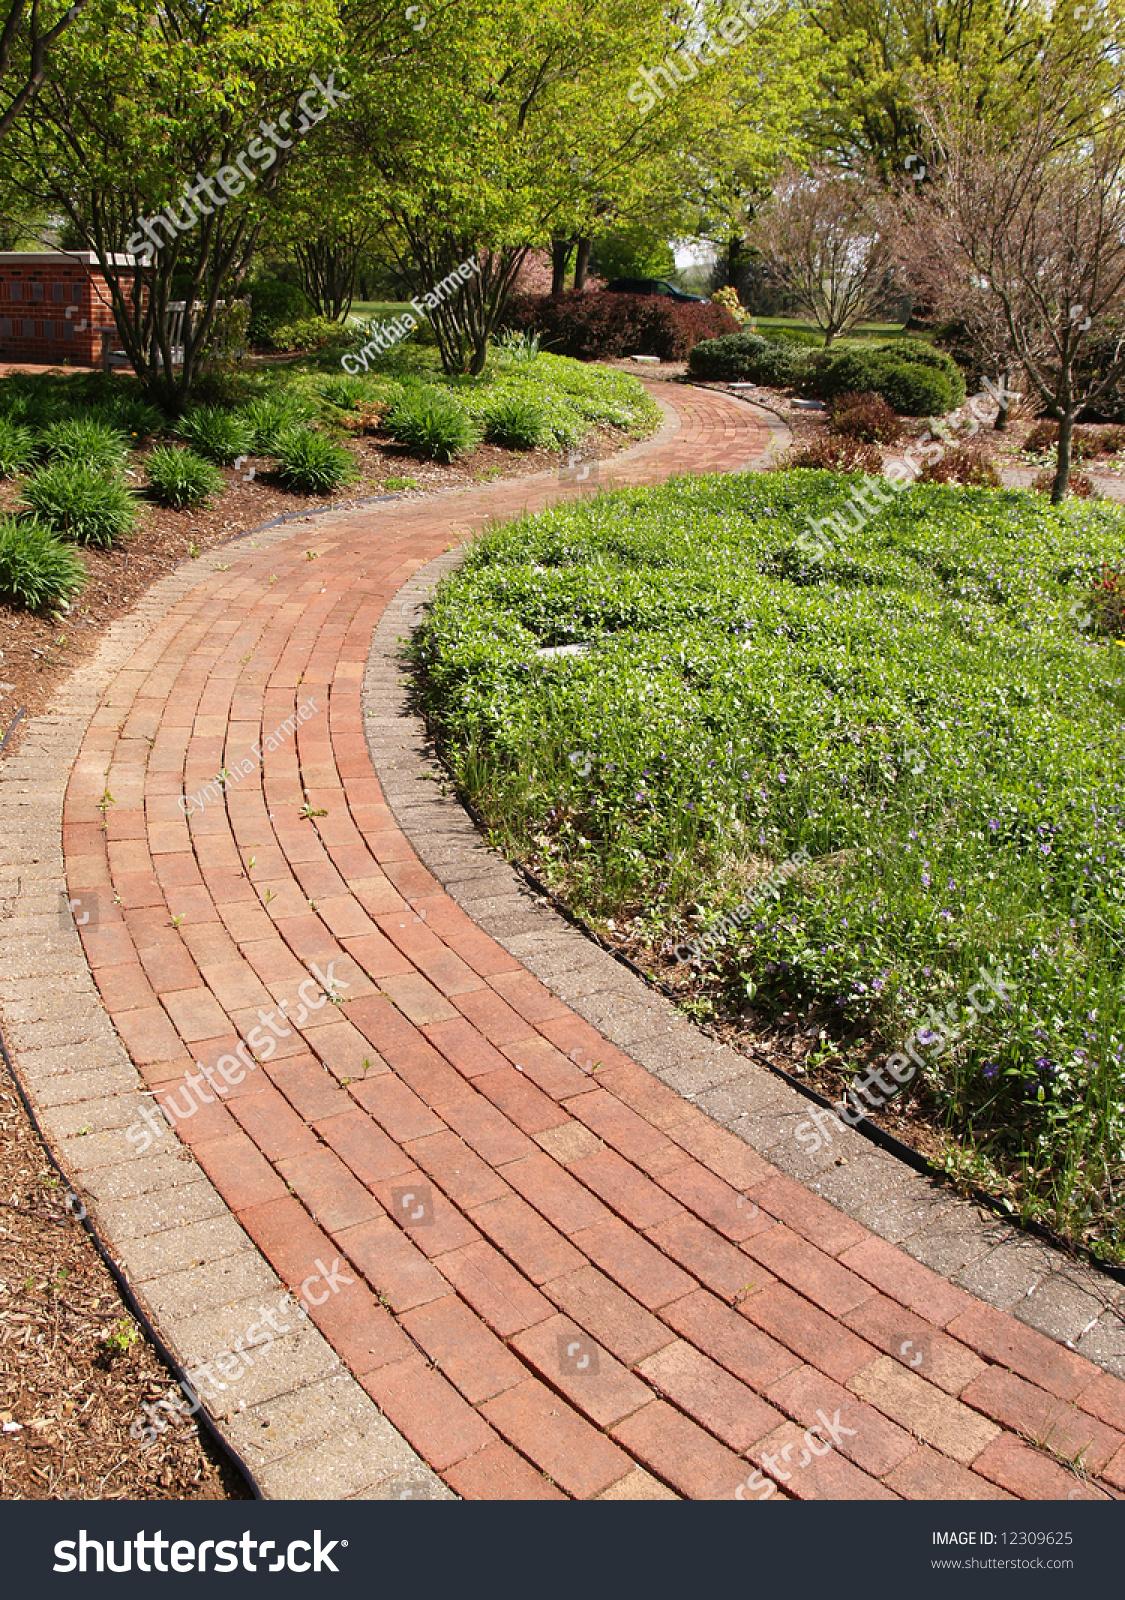 A Winding Brick Path In A Garden Stock Photo 12309625 : Shutterstock